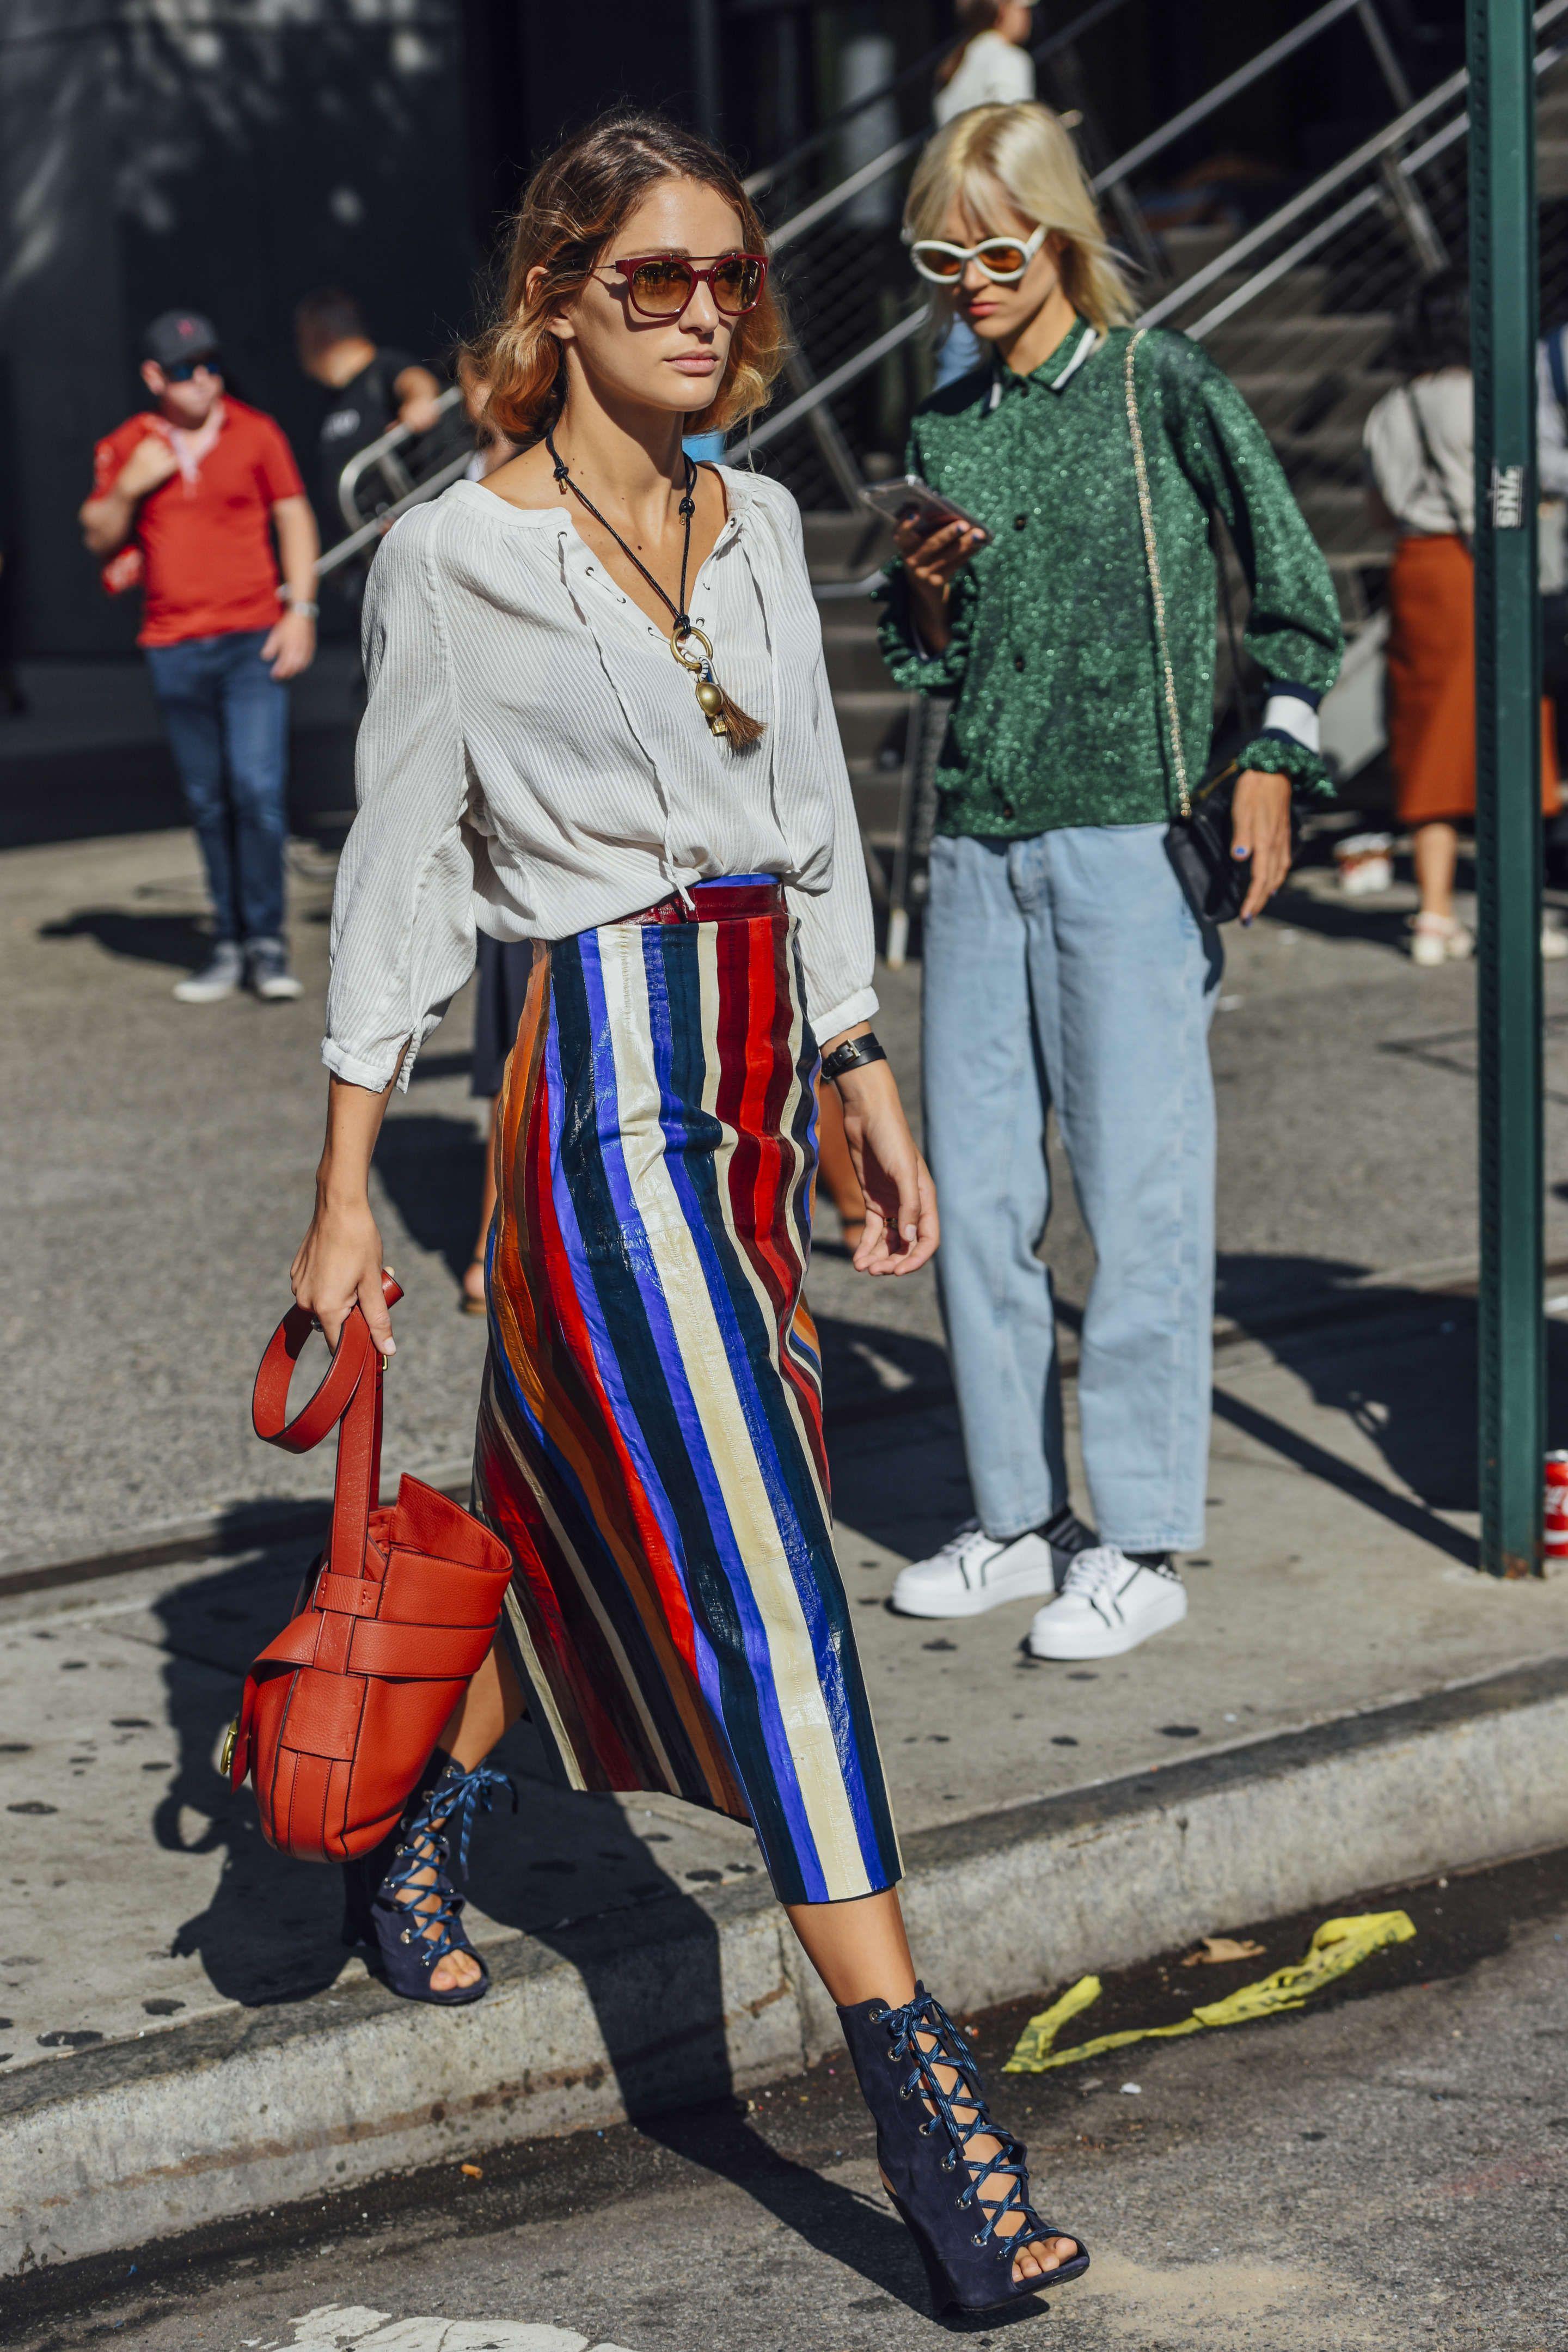 e77780e694e09 Classy style    fashion  online  marketing ♤ re-pinned